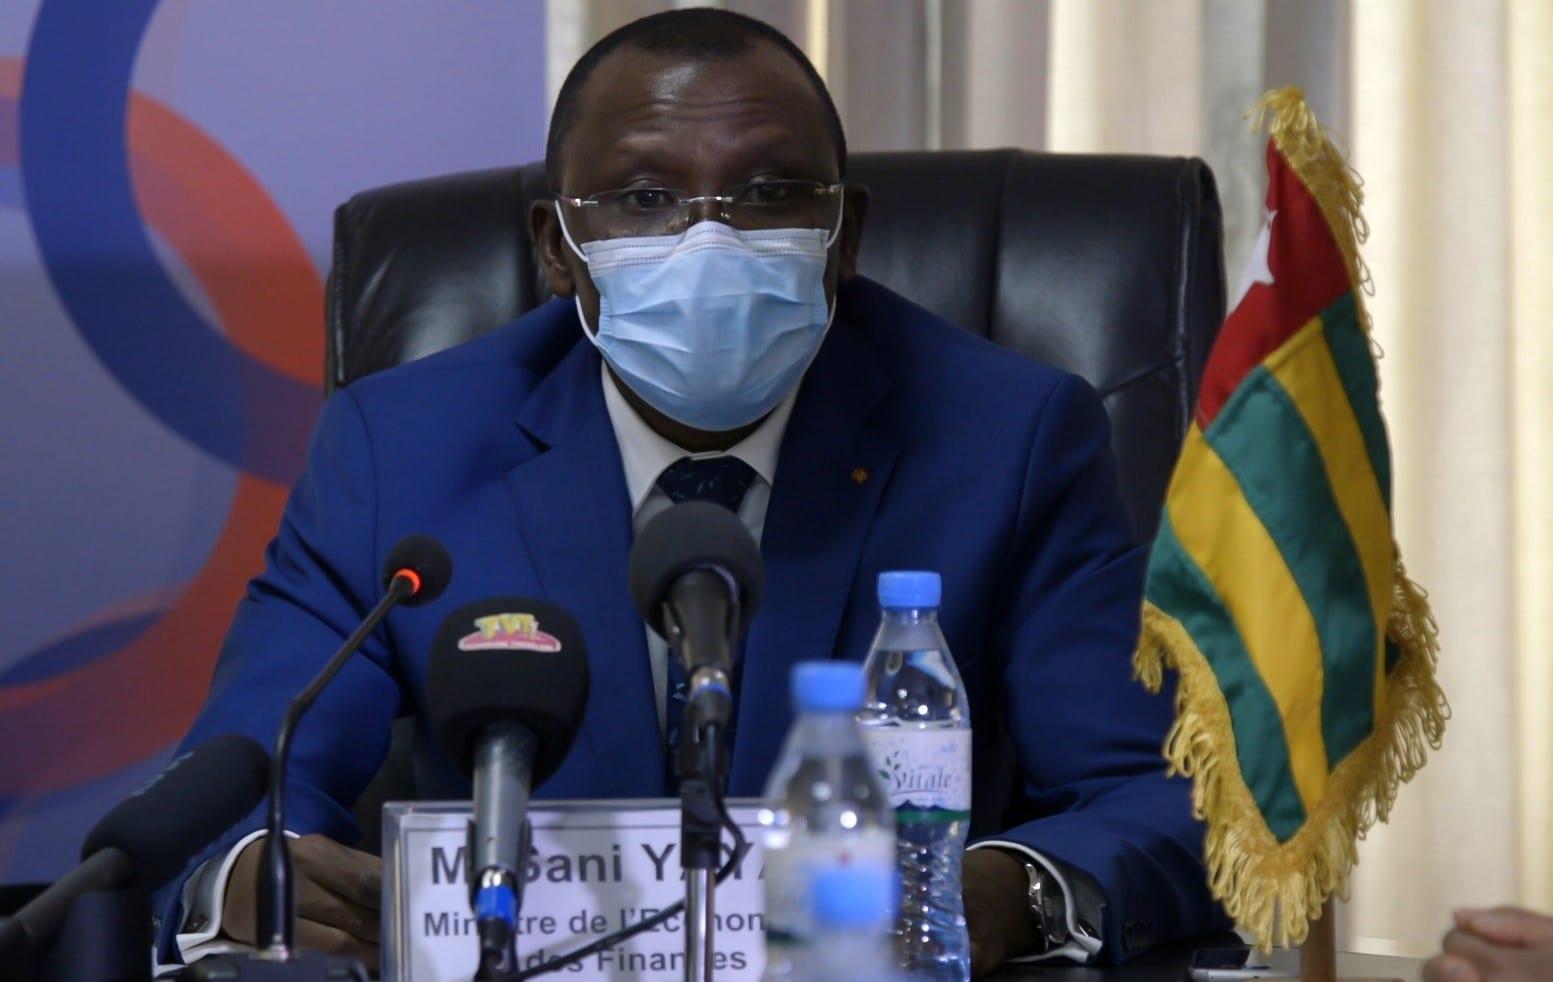 Togo: Le Ministre Sani Yaya Met En Garde Les Sociétés De Trading